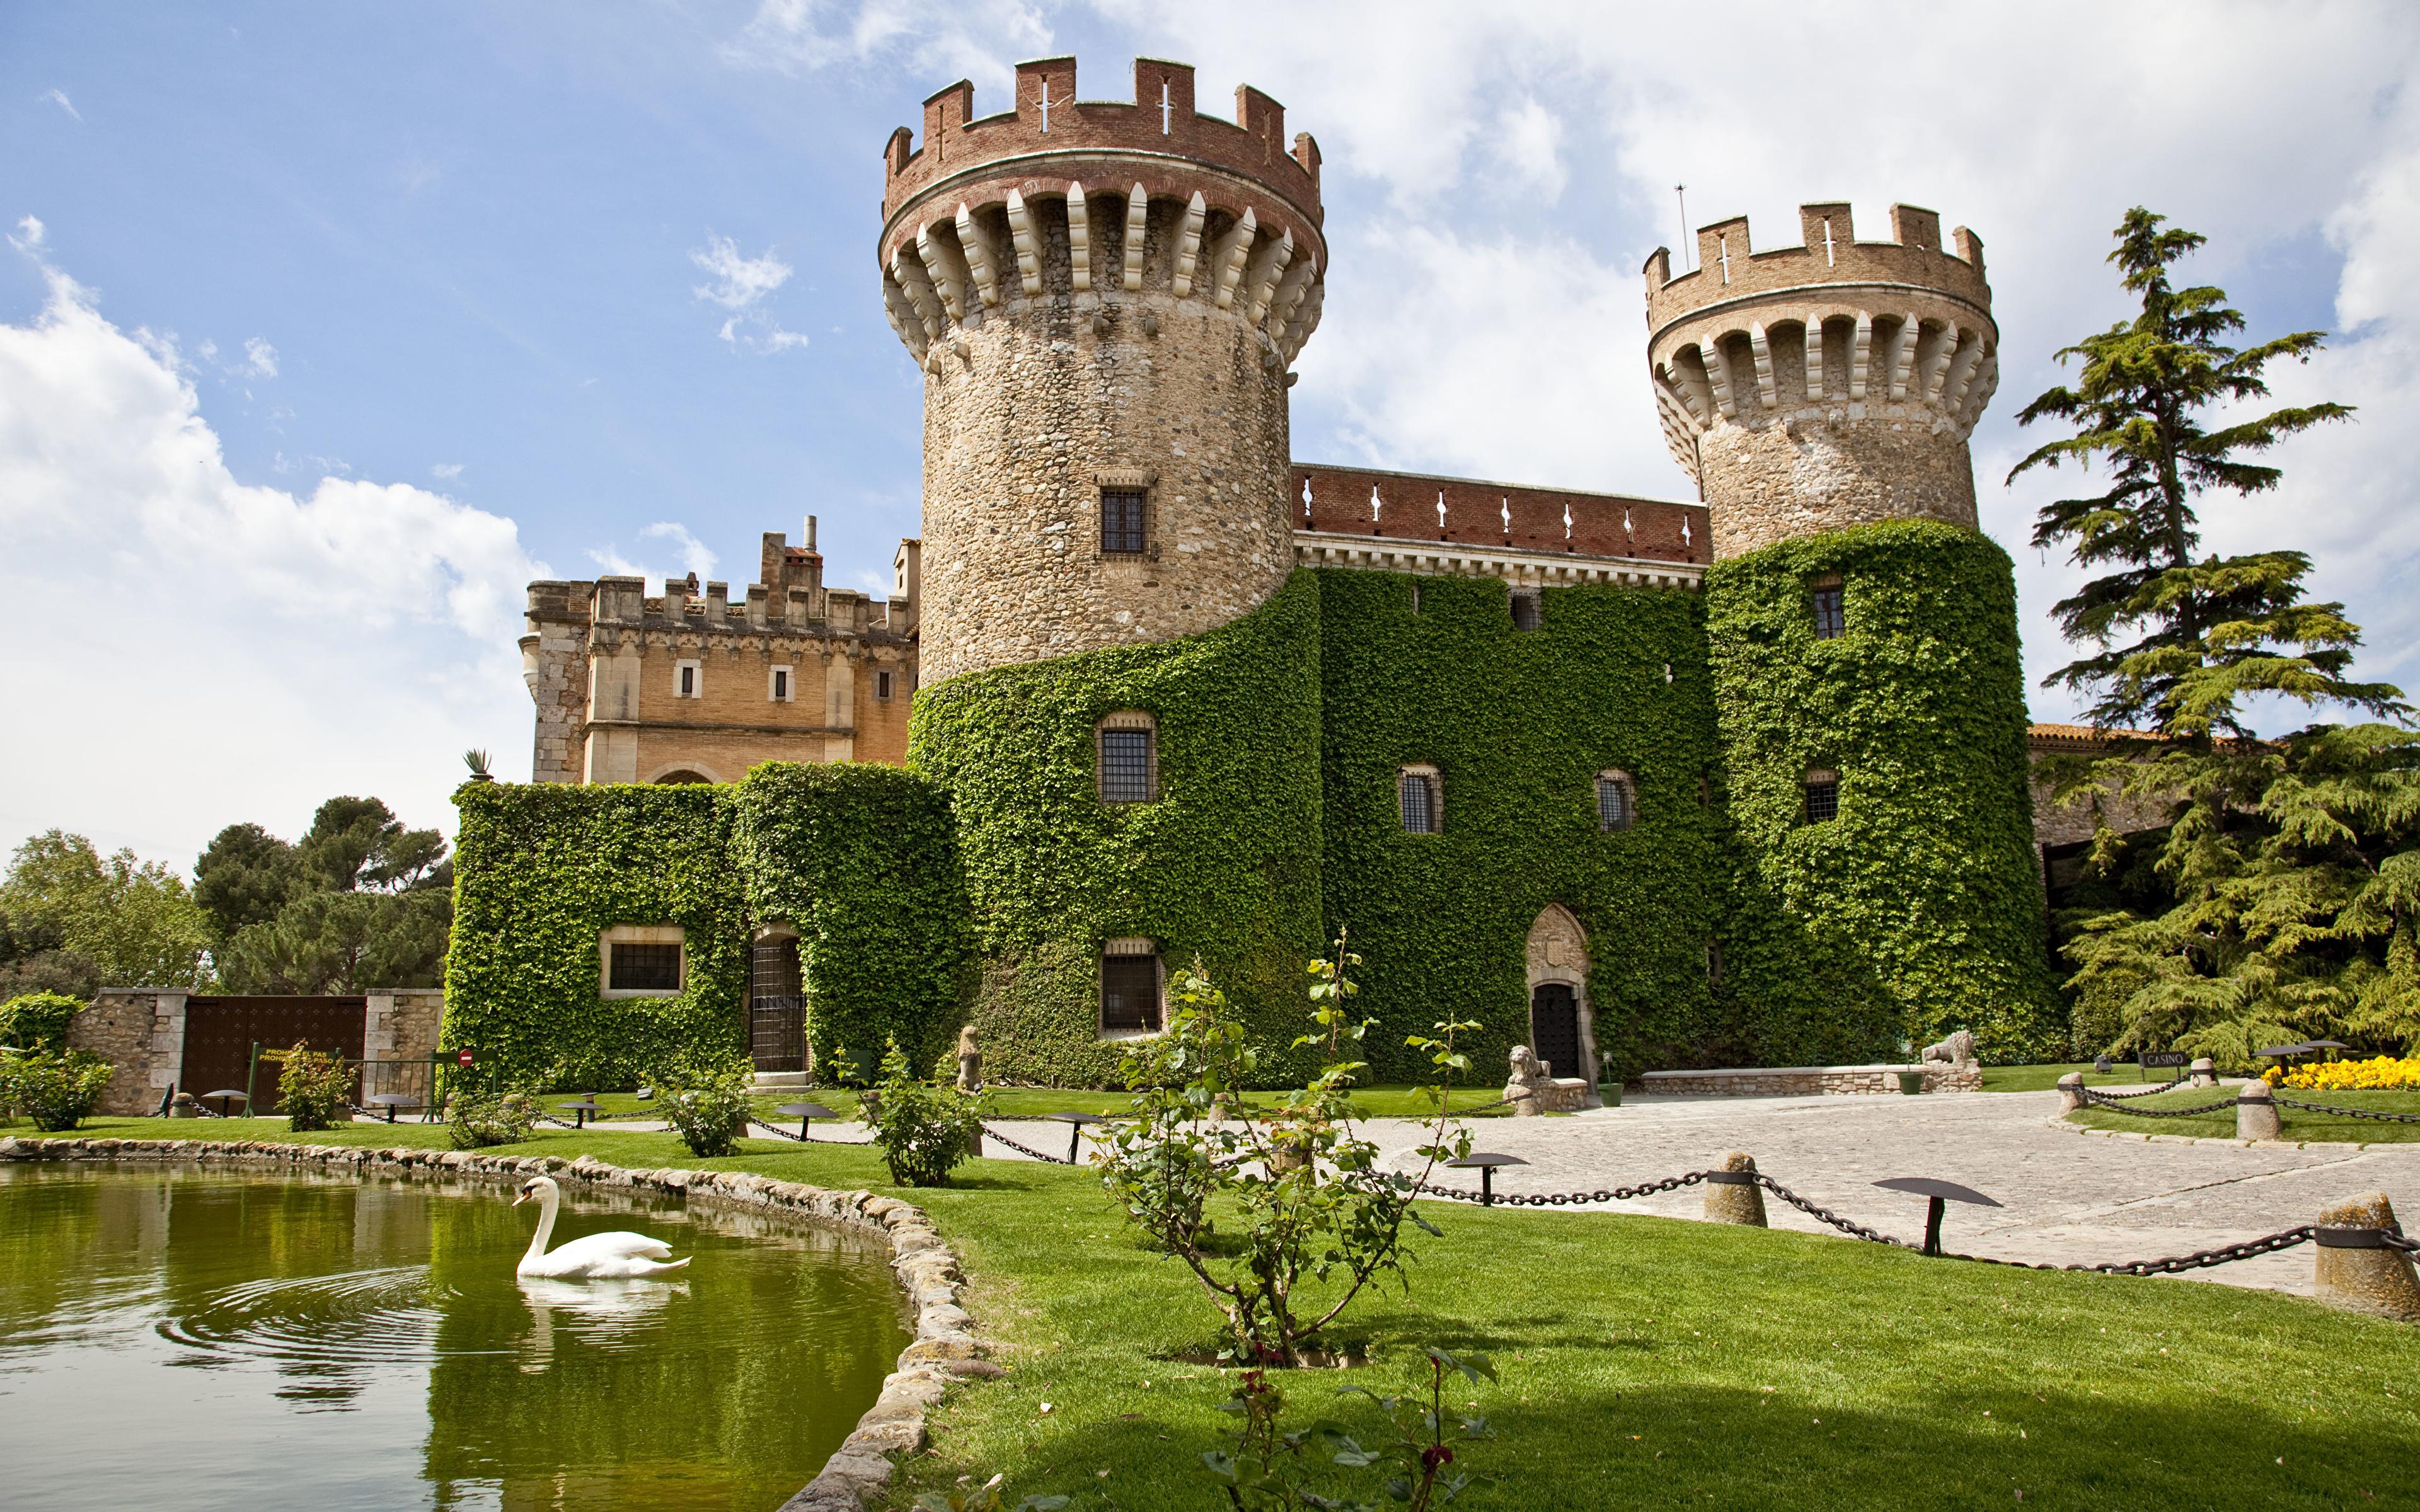 Image swan Birds Spain Tower Peralada Castle, Girona castle Pond Grass Cities 3840x2400 bird Swans towers Castles